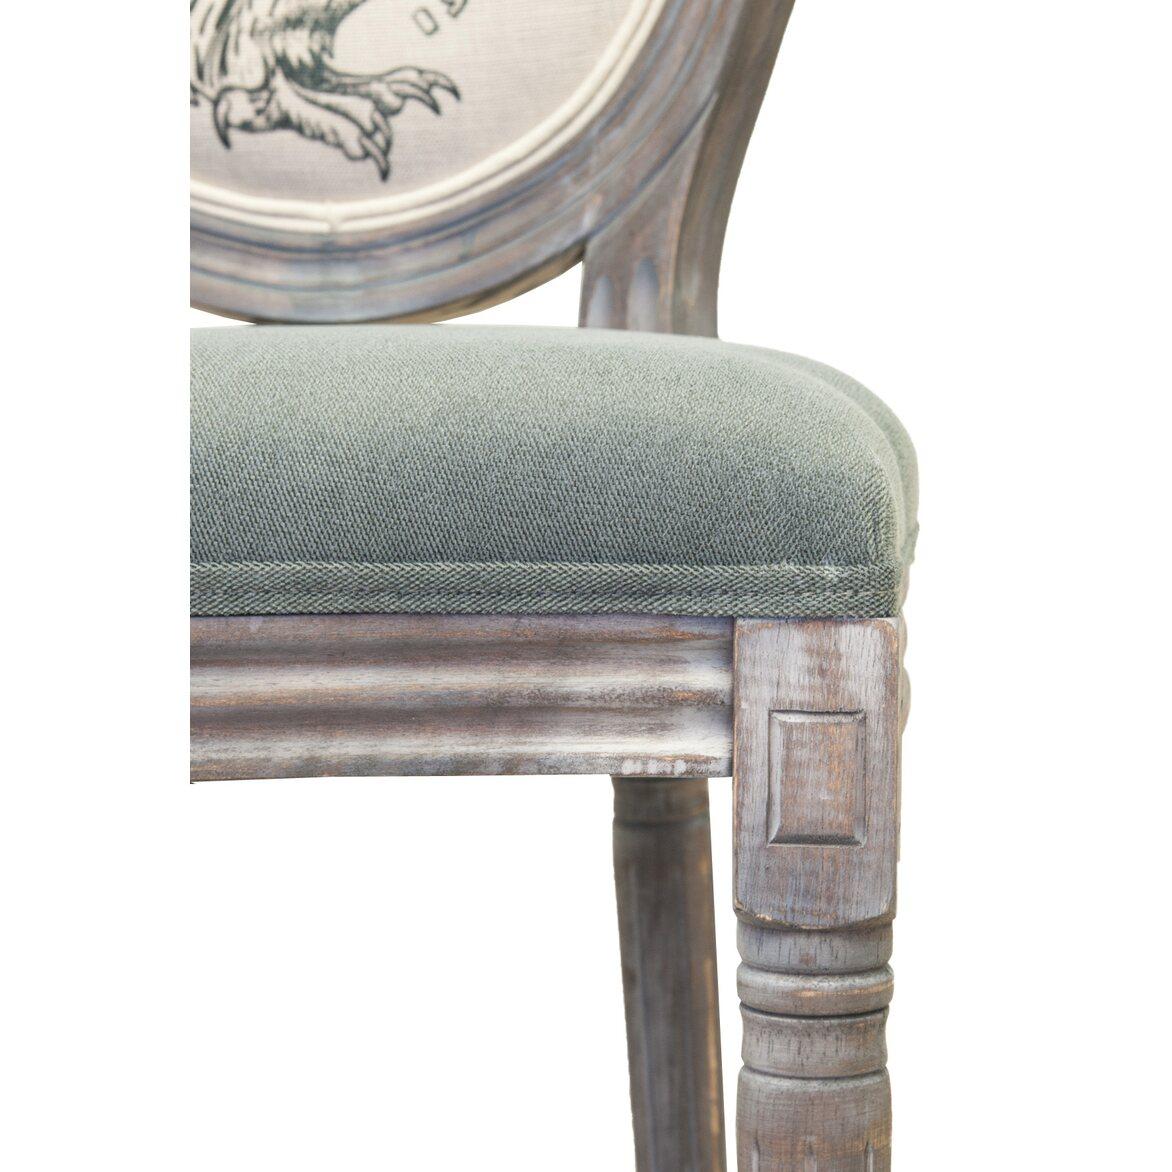 Стул Volker owl ver. 2 6 | Обеденные стулья Kingsby